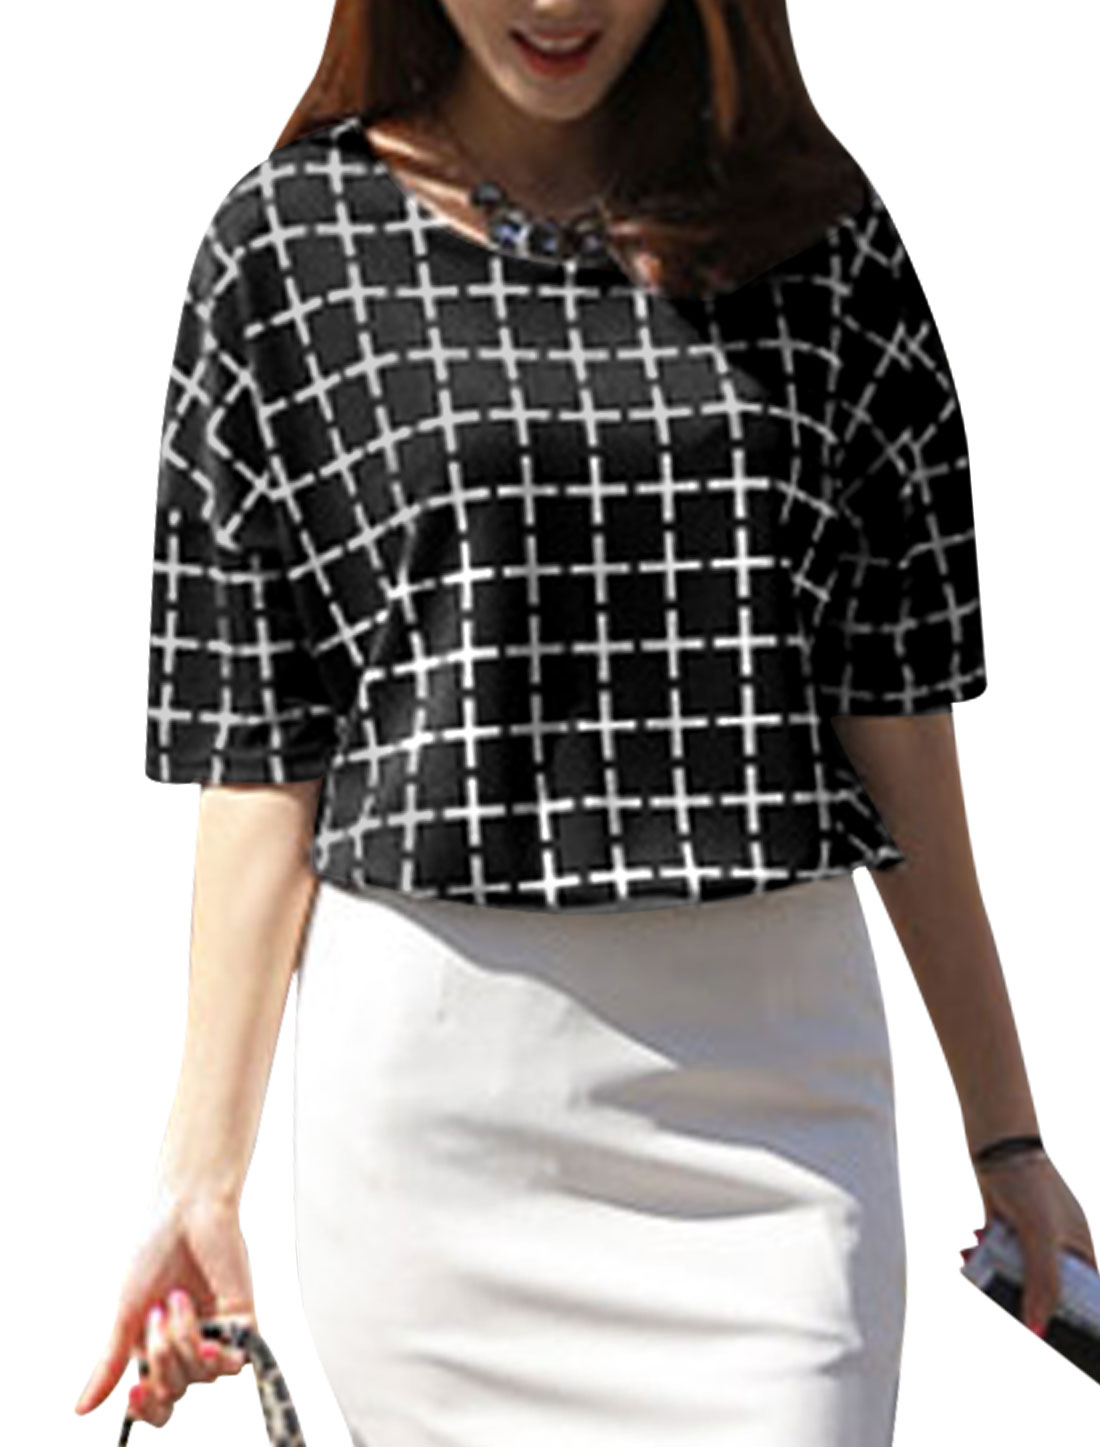 Lady Half Batwing Sleeve Cross Pattern Tunic Top Black S